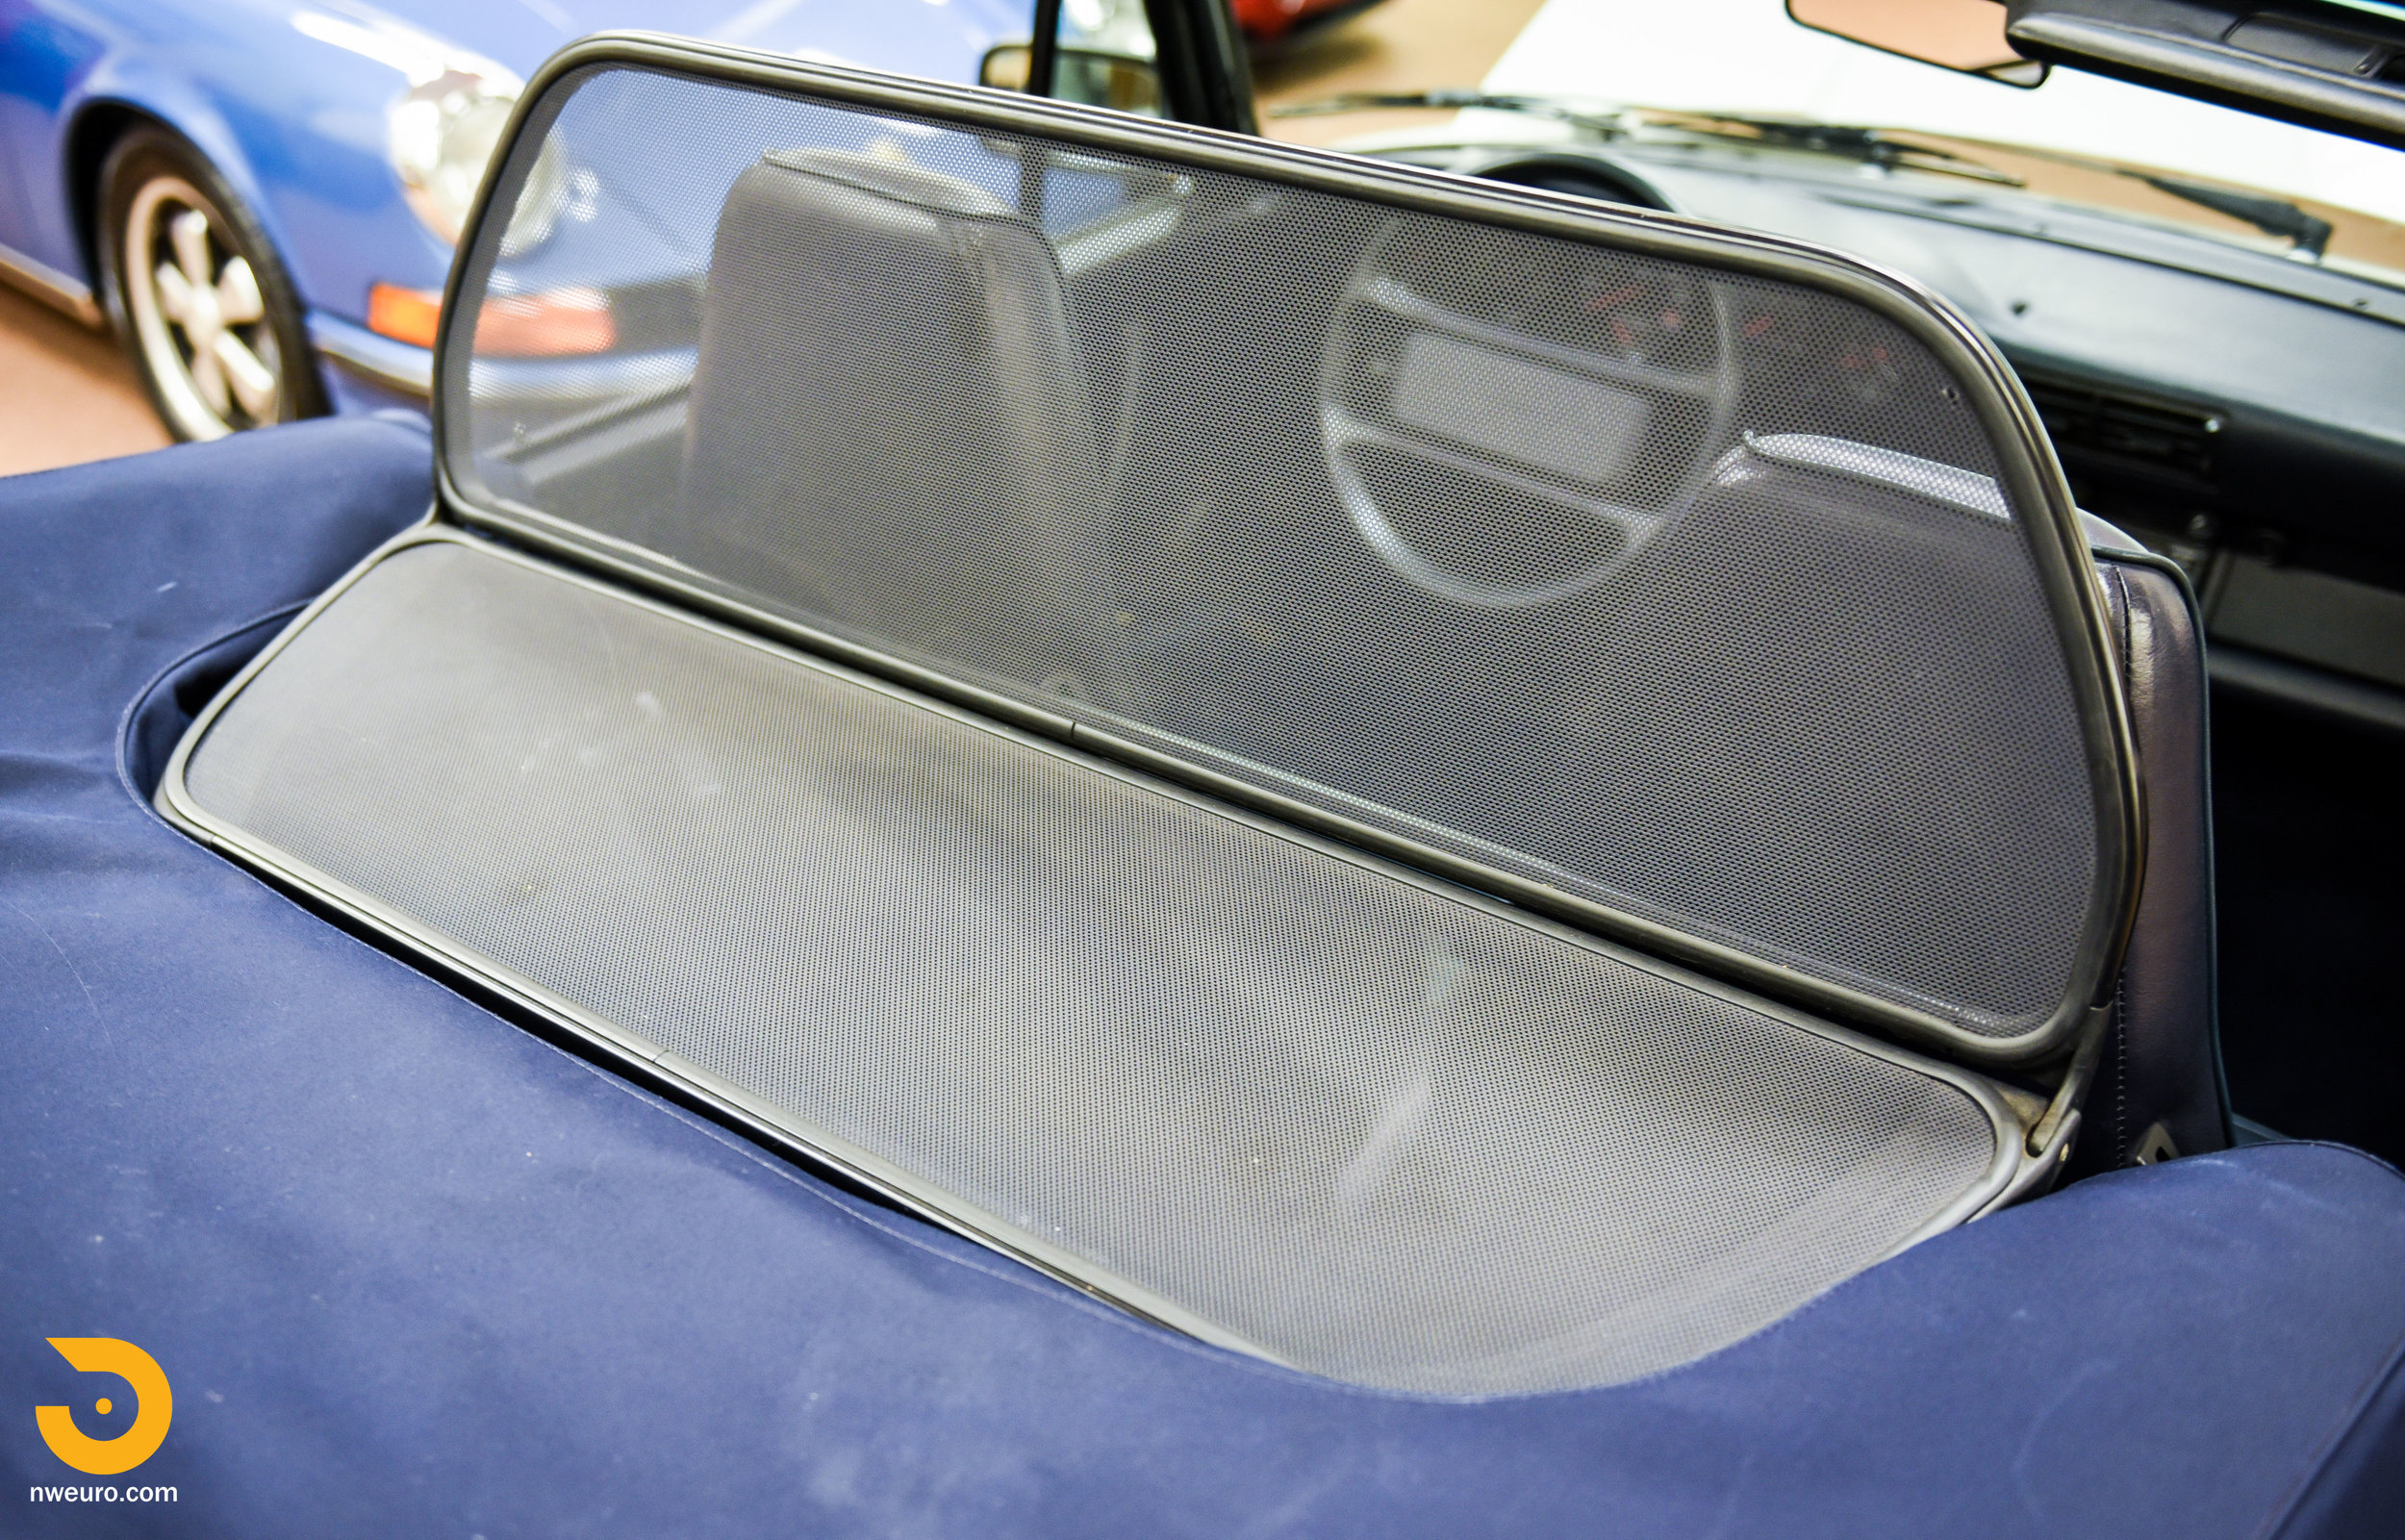 1987 Porsche 930 Slant Nose Cab Details-32.jpg